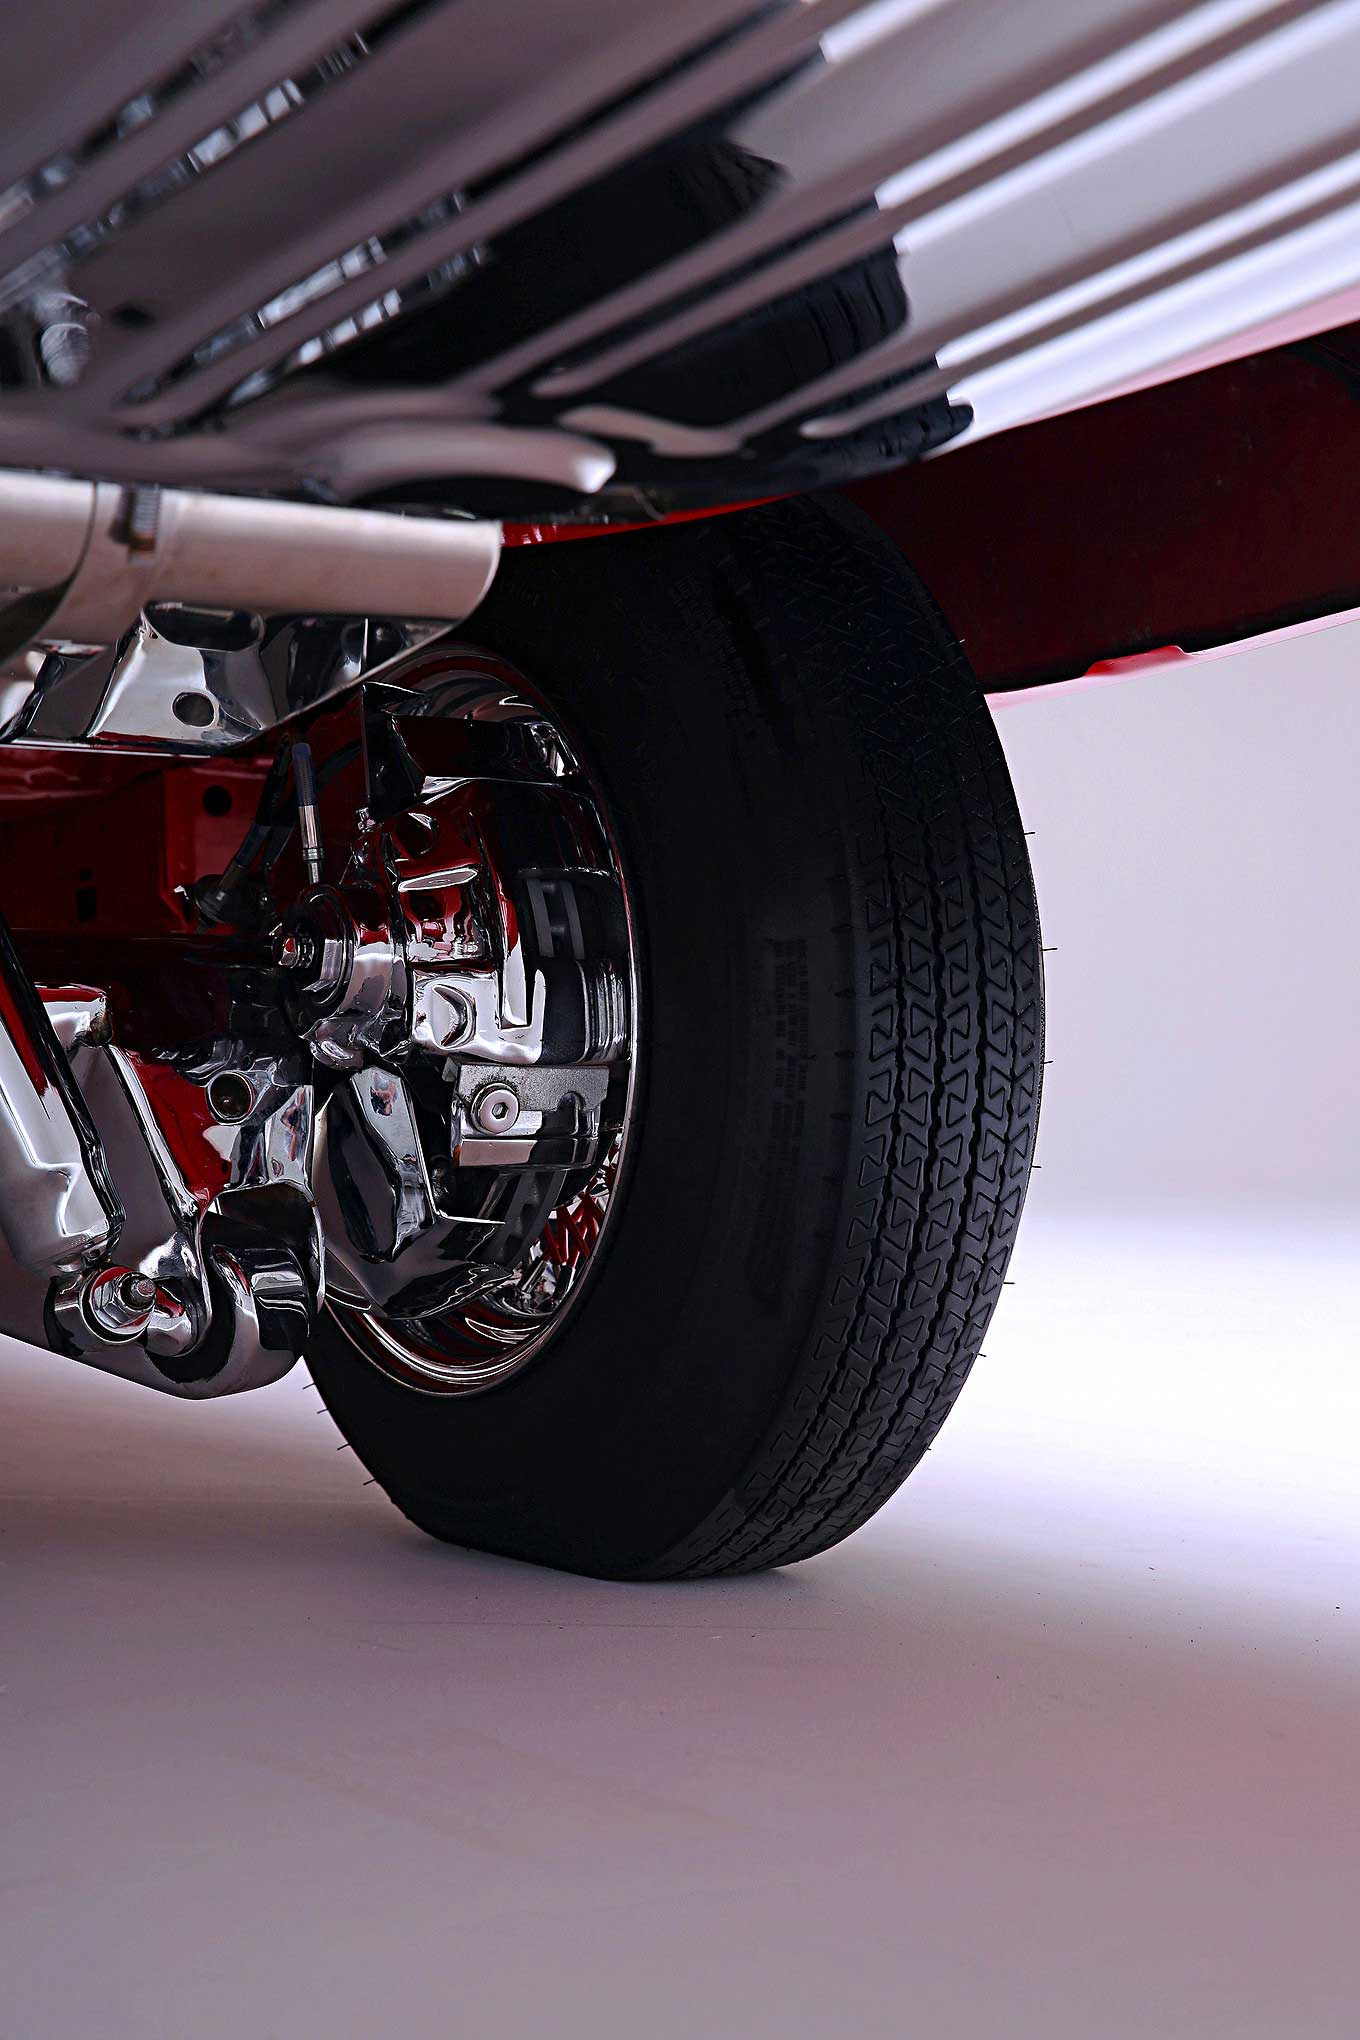 2013 chevy impala exhaust autos post. Black Bedroom Furniture Sets. Home Design Ideas